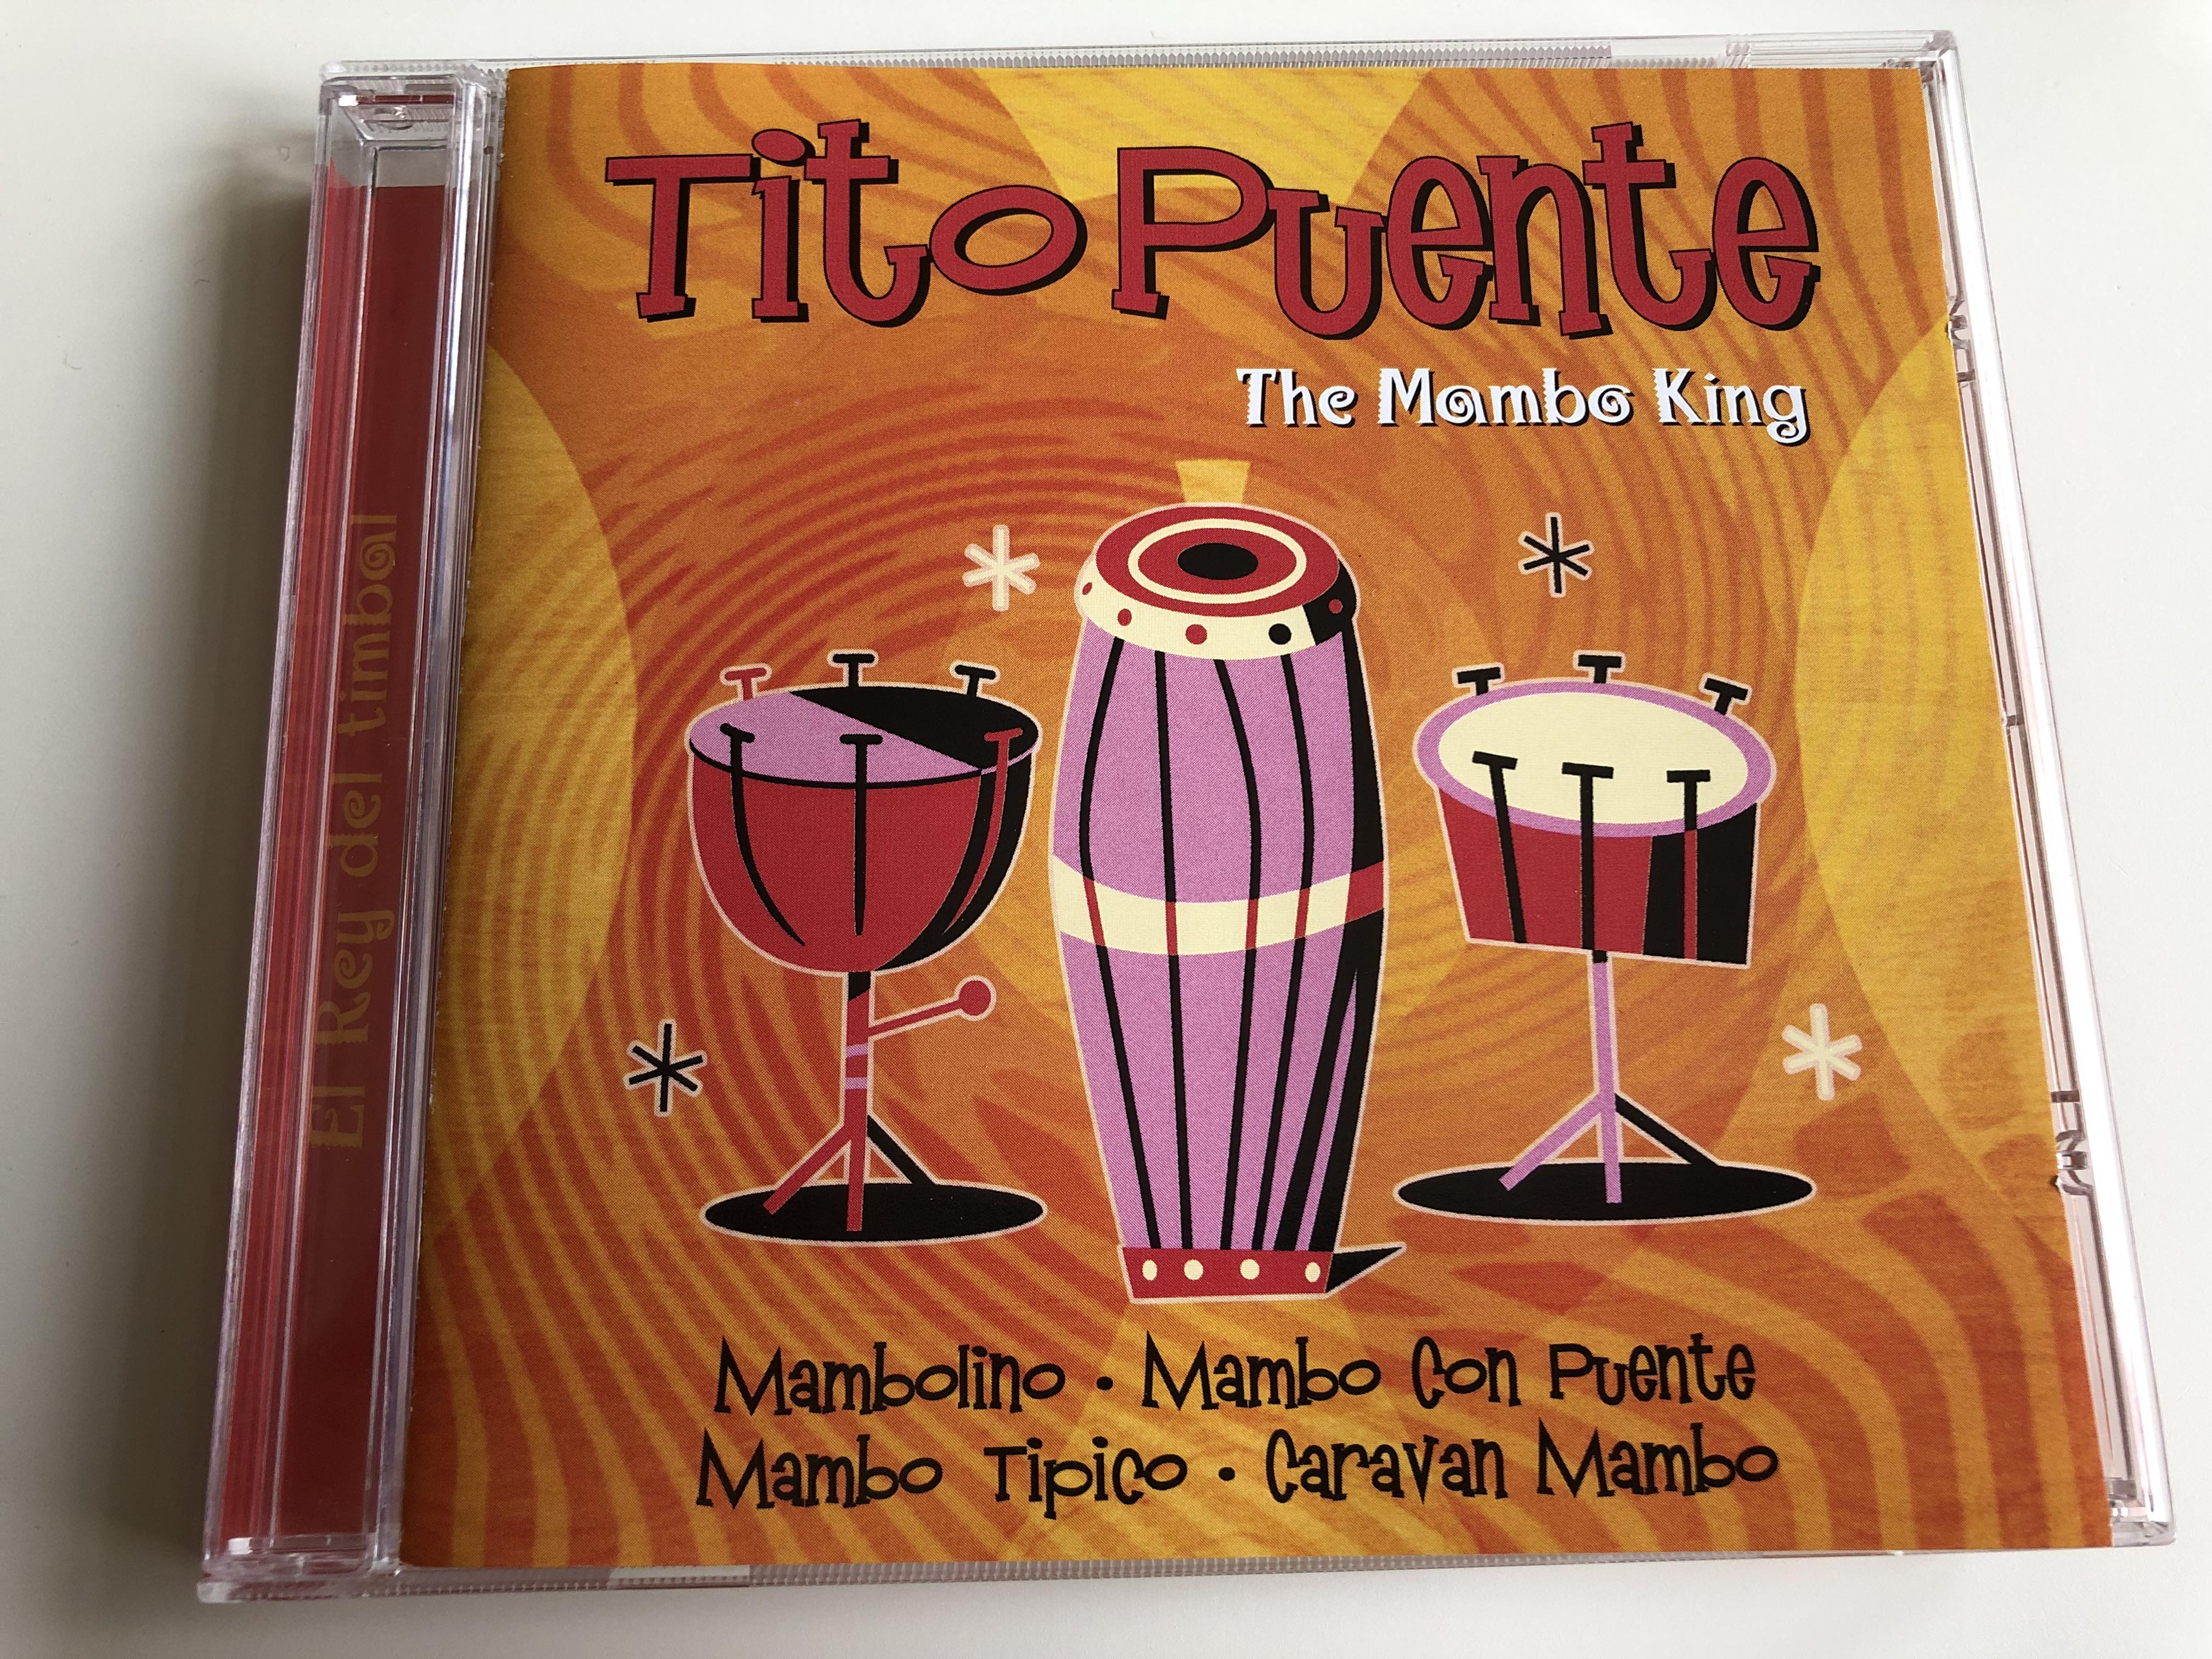 titopuente-the-mambo-kingimg-3945.jpg